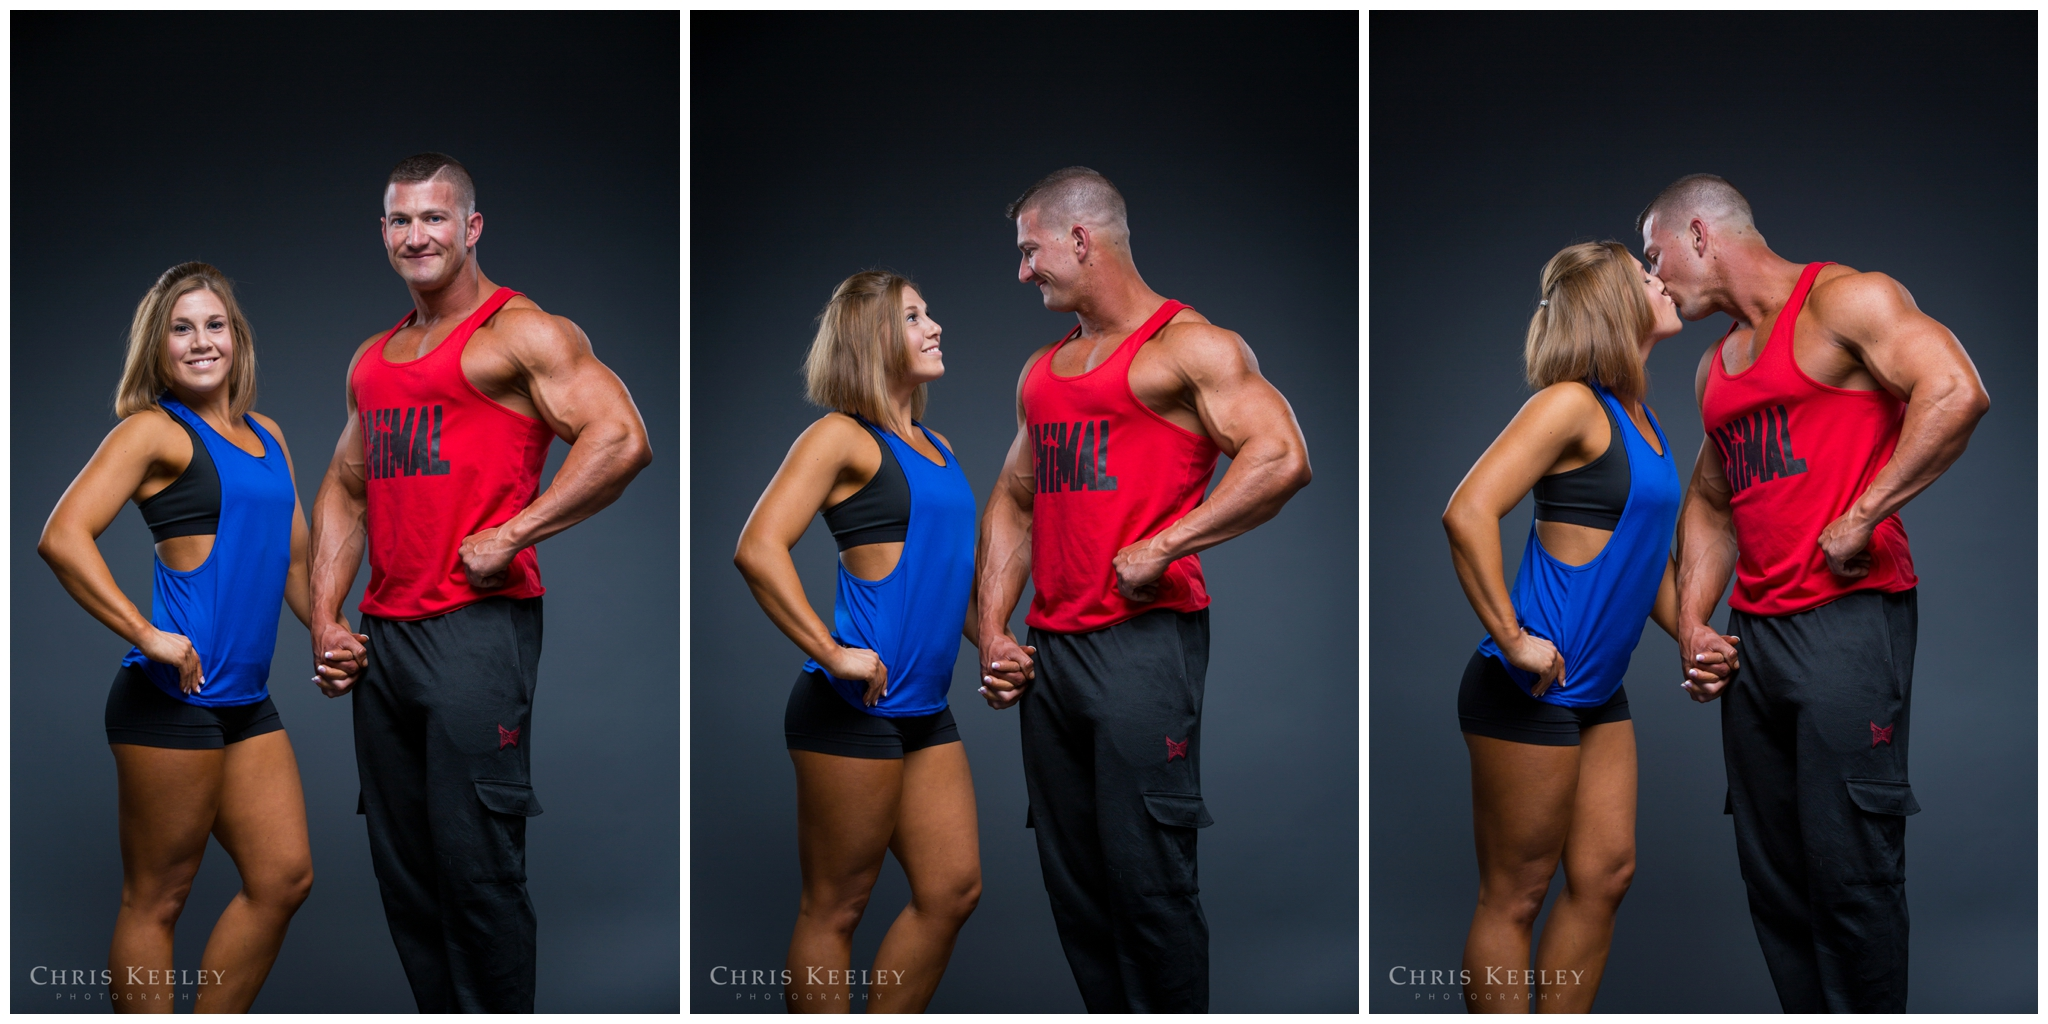 14-Joel-and-Katie-by-Chris-Keeley-Photography web-wmk.jpg